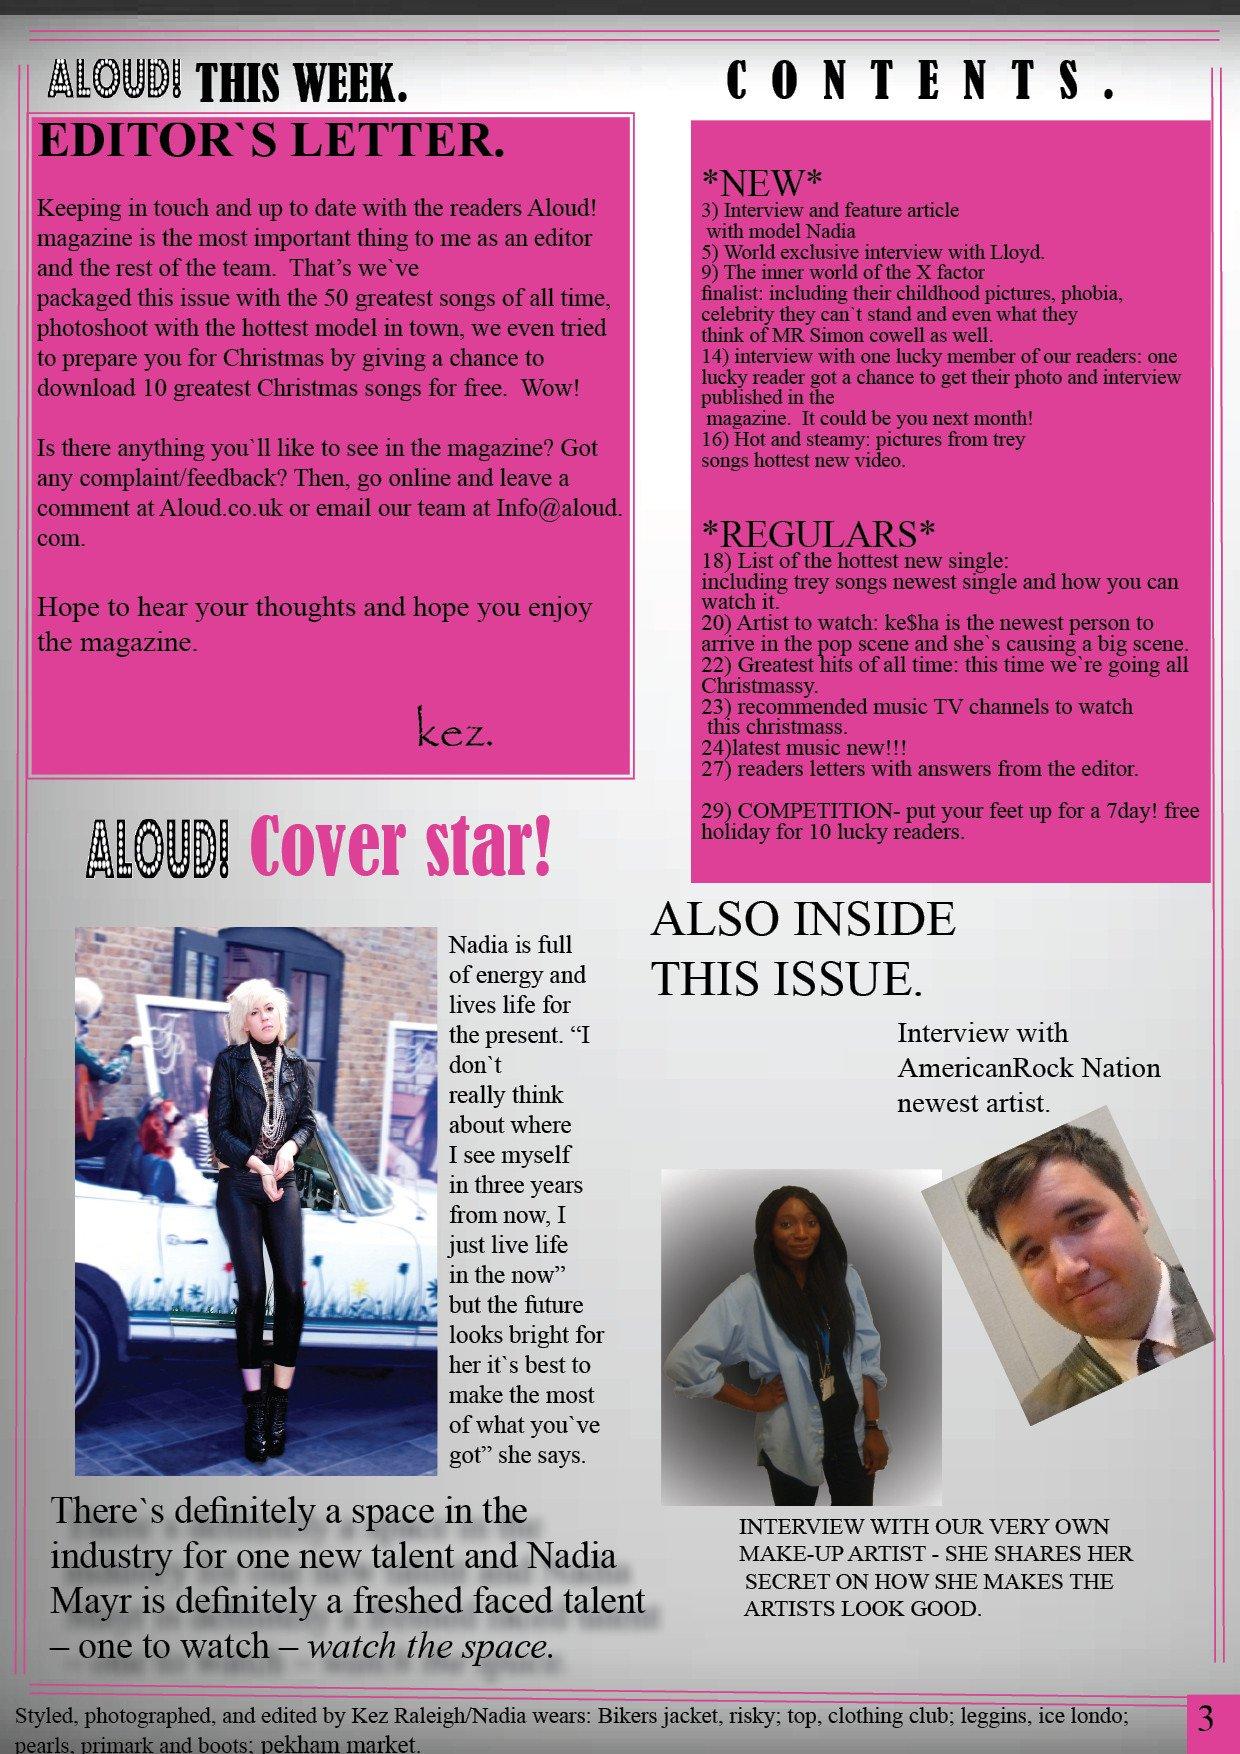 Magazine Template for Microsoft Word as Media Studies